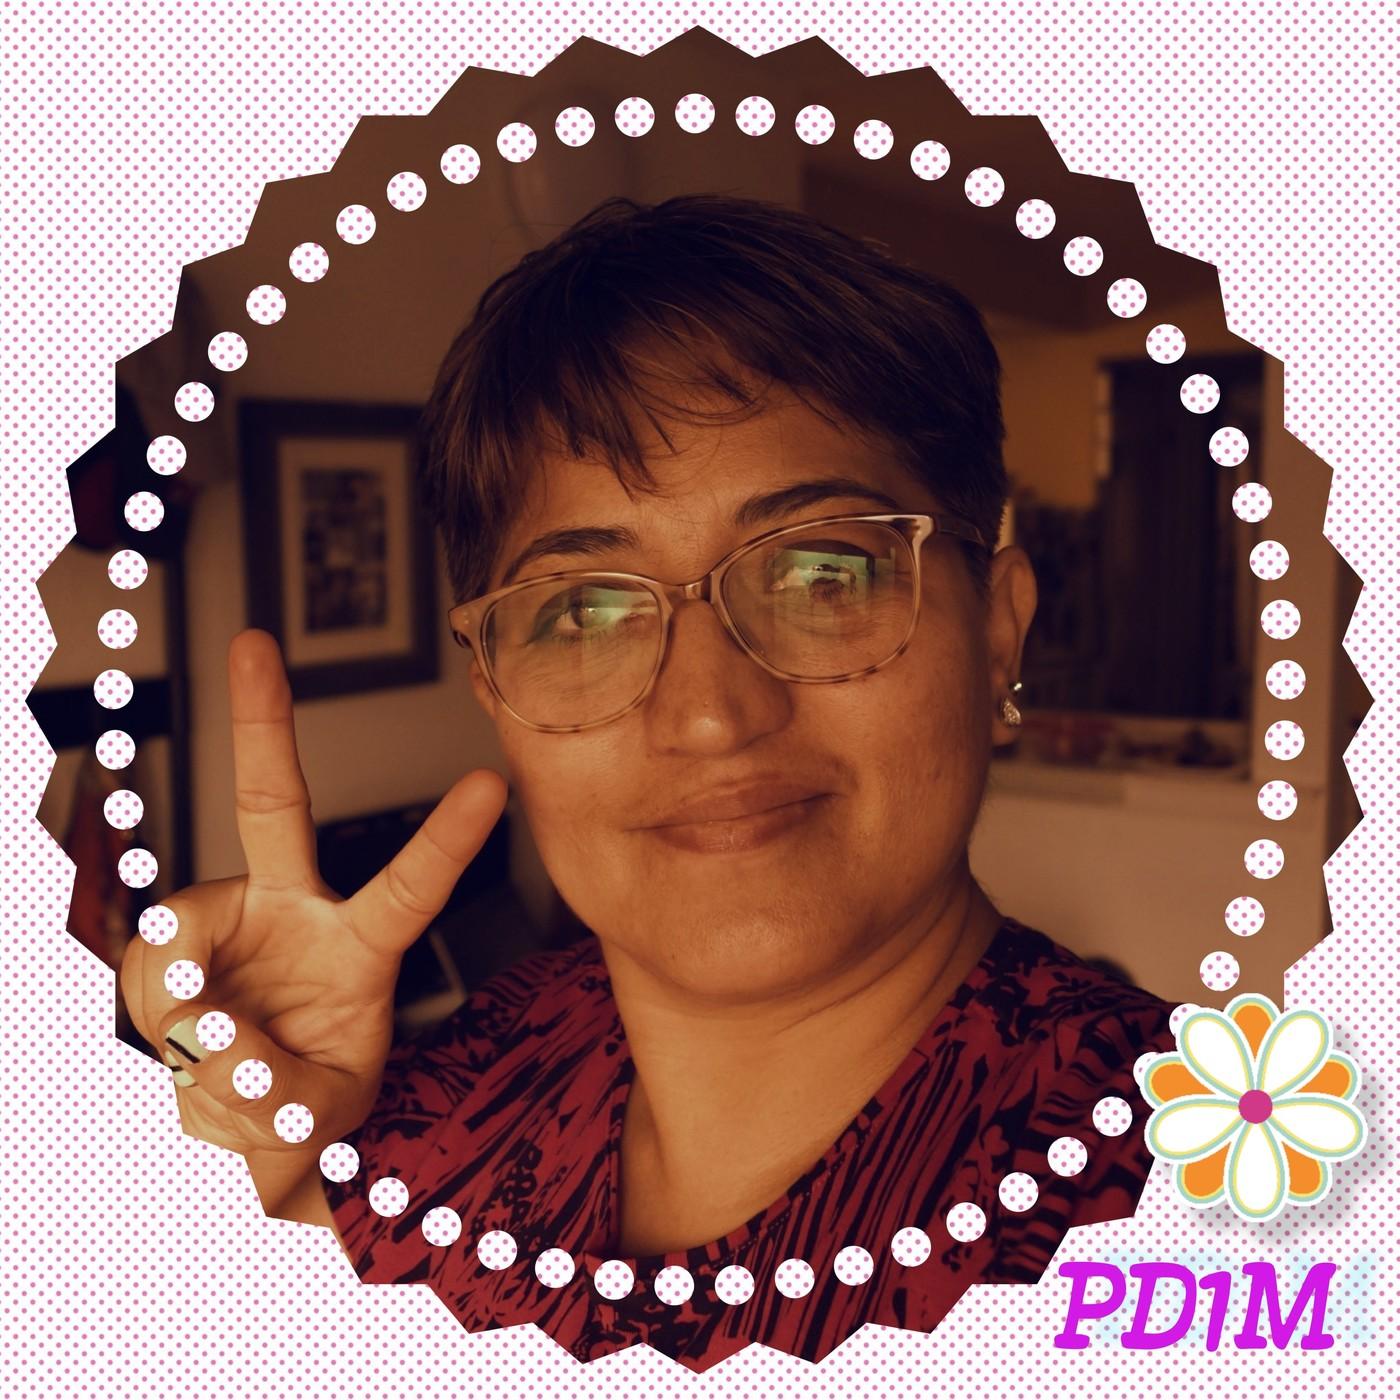 Como vamos cambiando PD1M.062